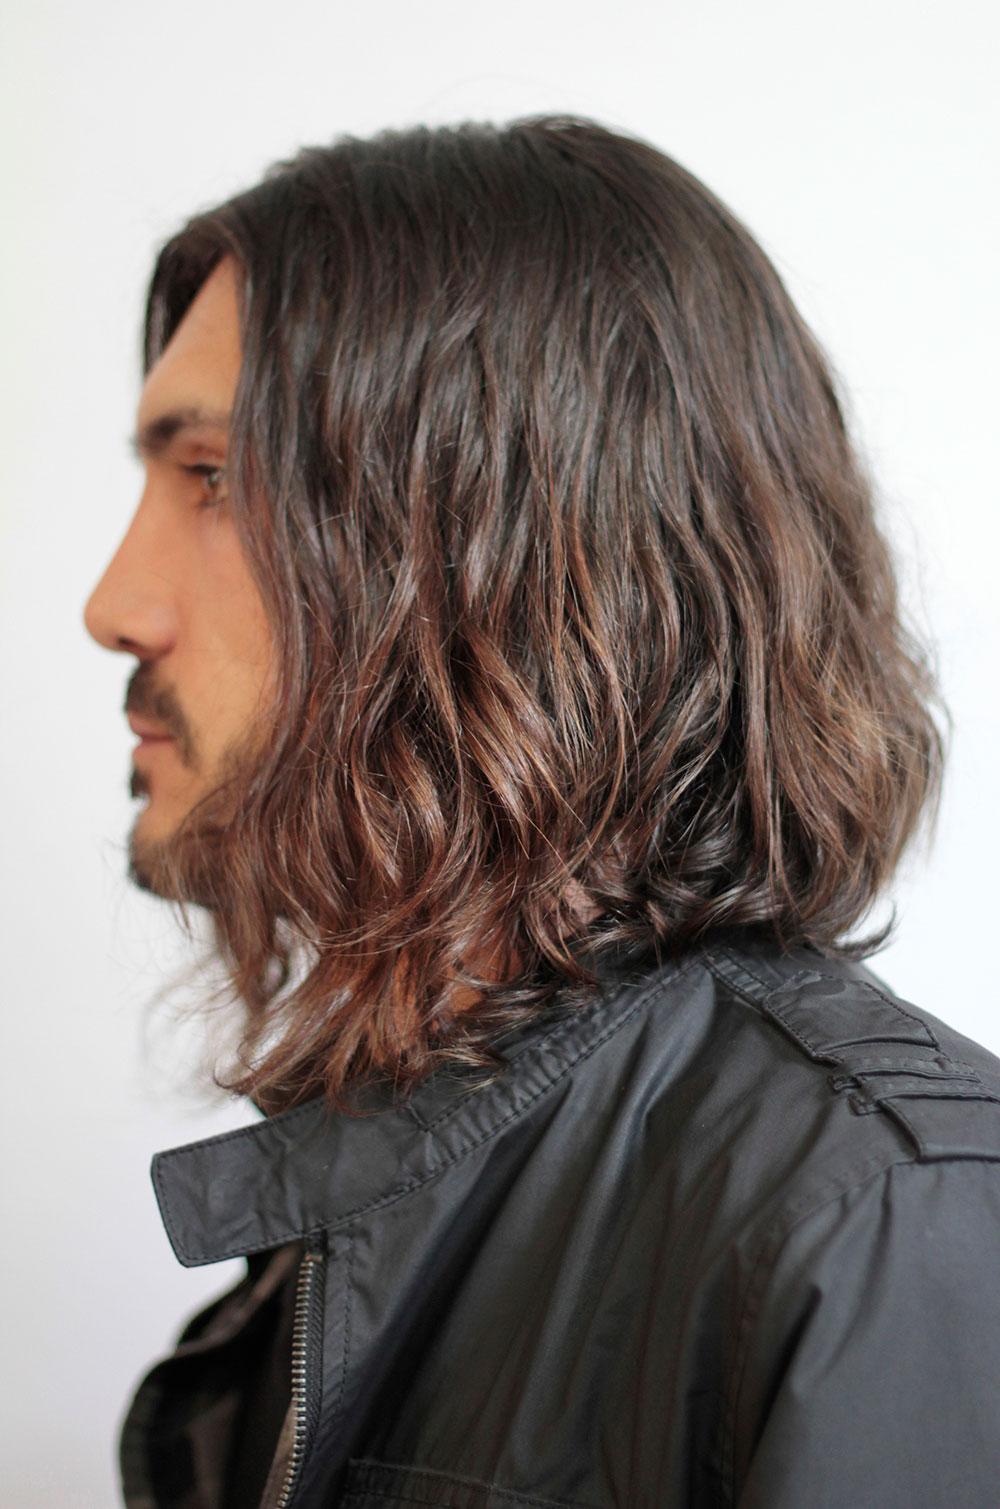 Men's hair by Morphic